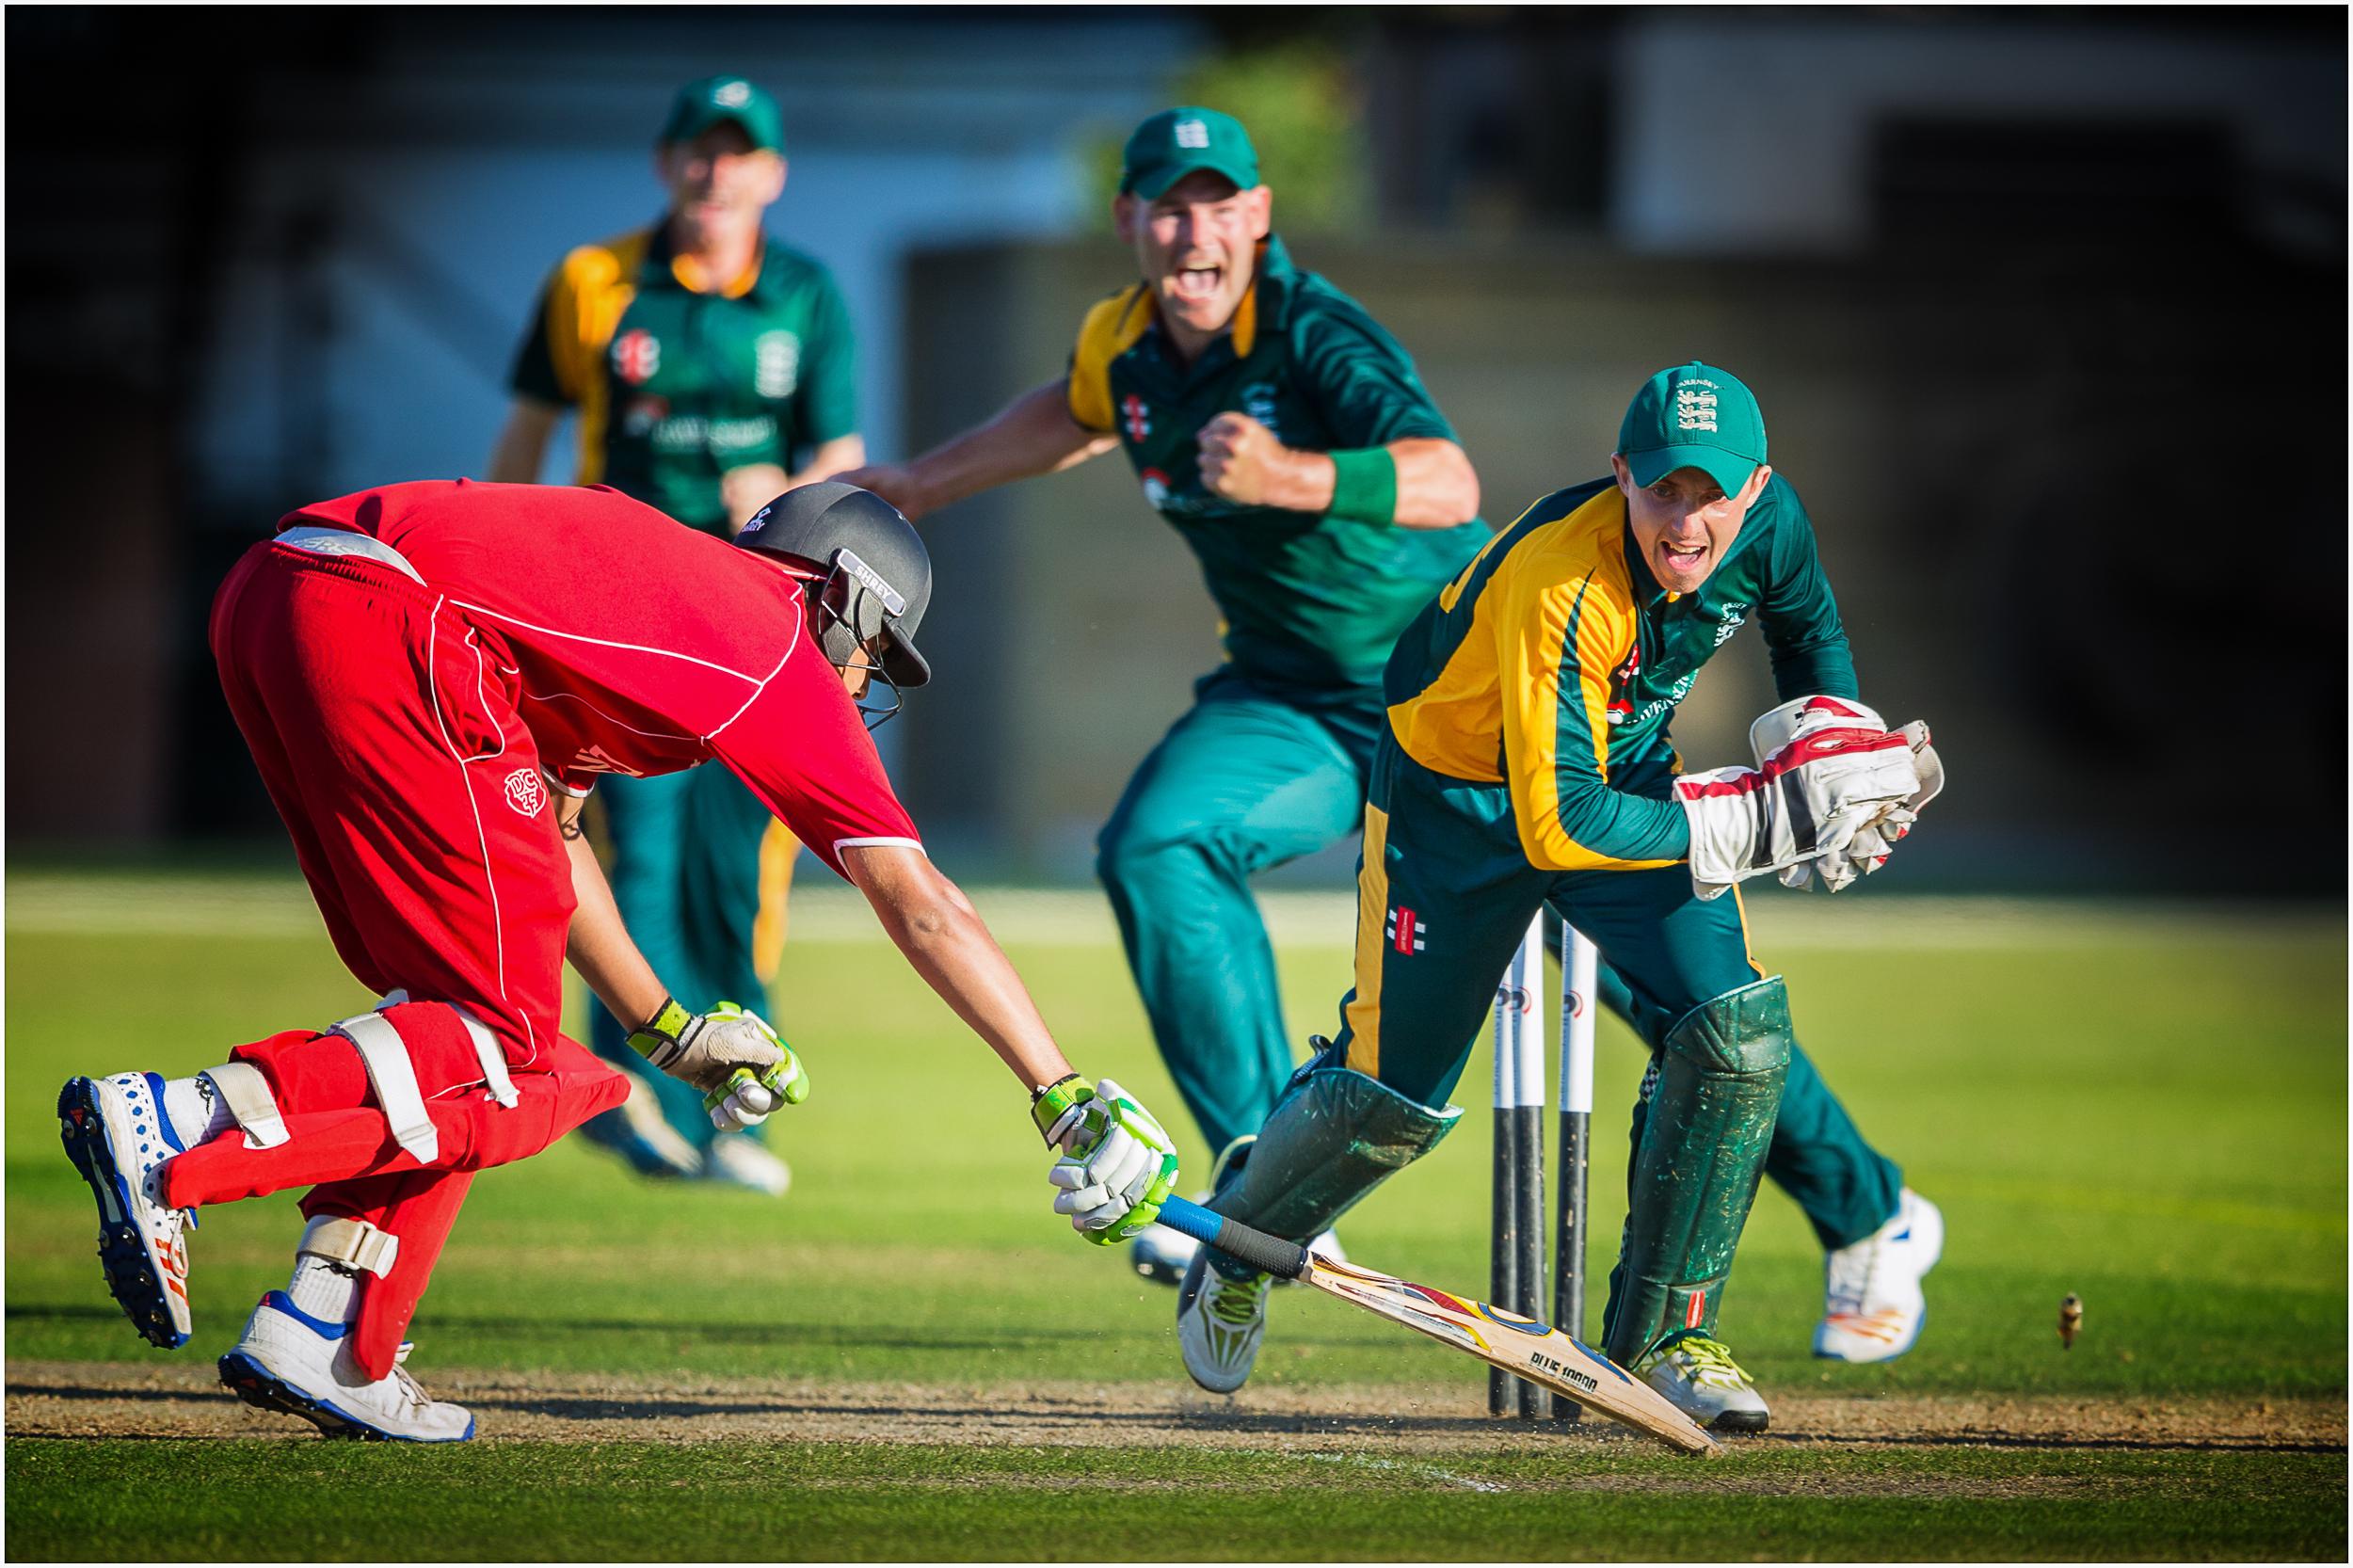 Jason Martin runs out a Danish batsman in a Guernsey v Denmark game at KGV Playing Fields in 2017...